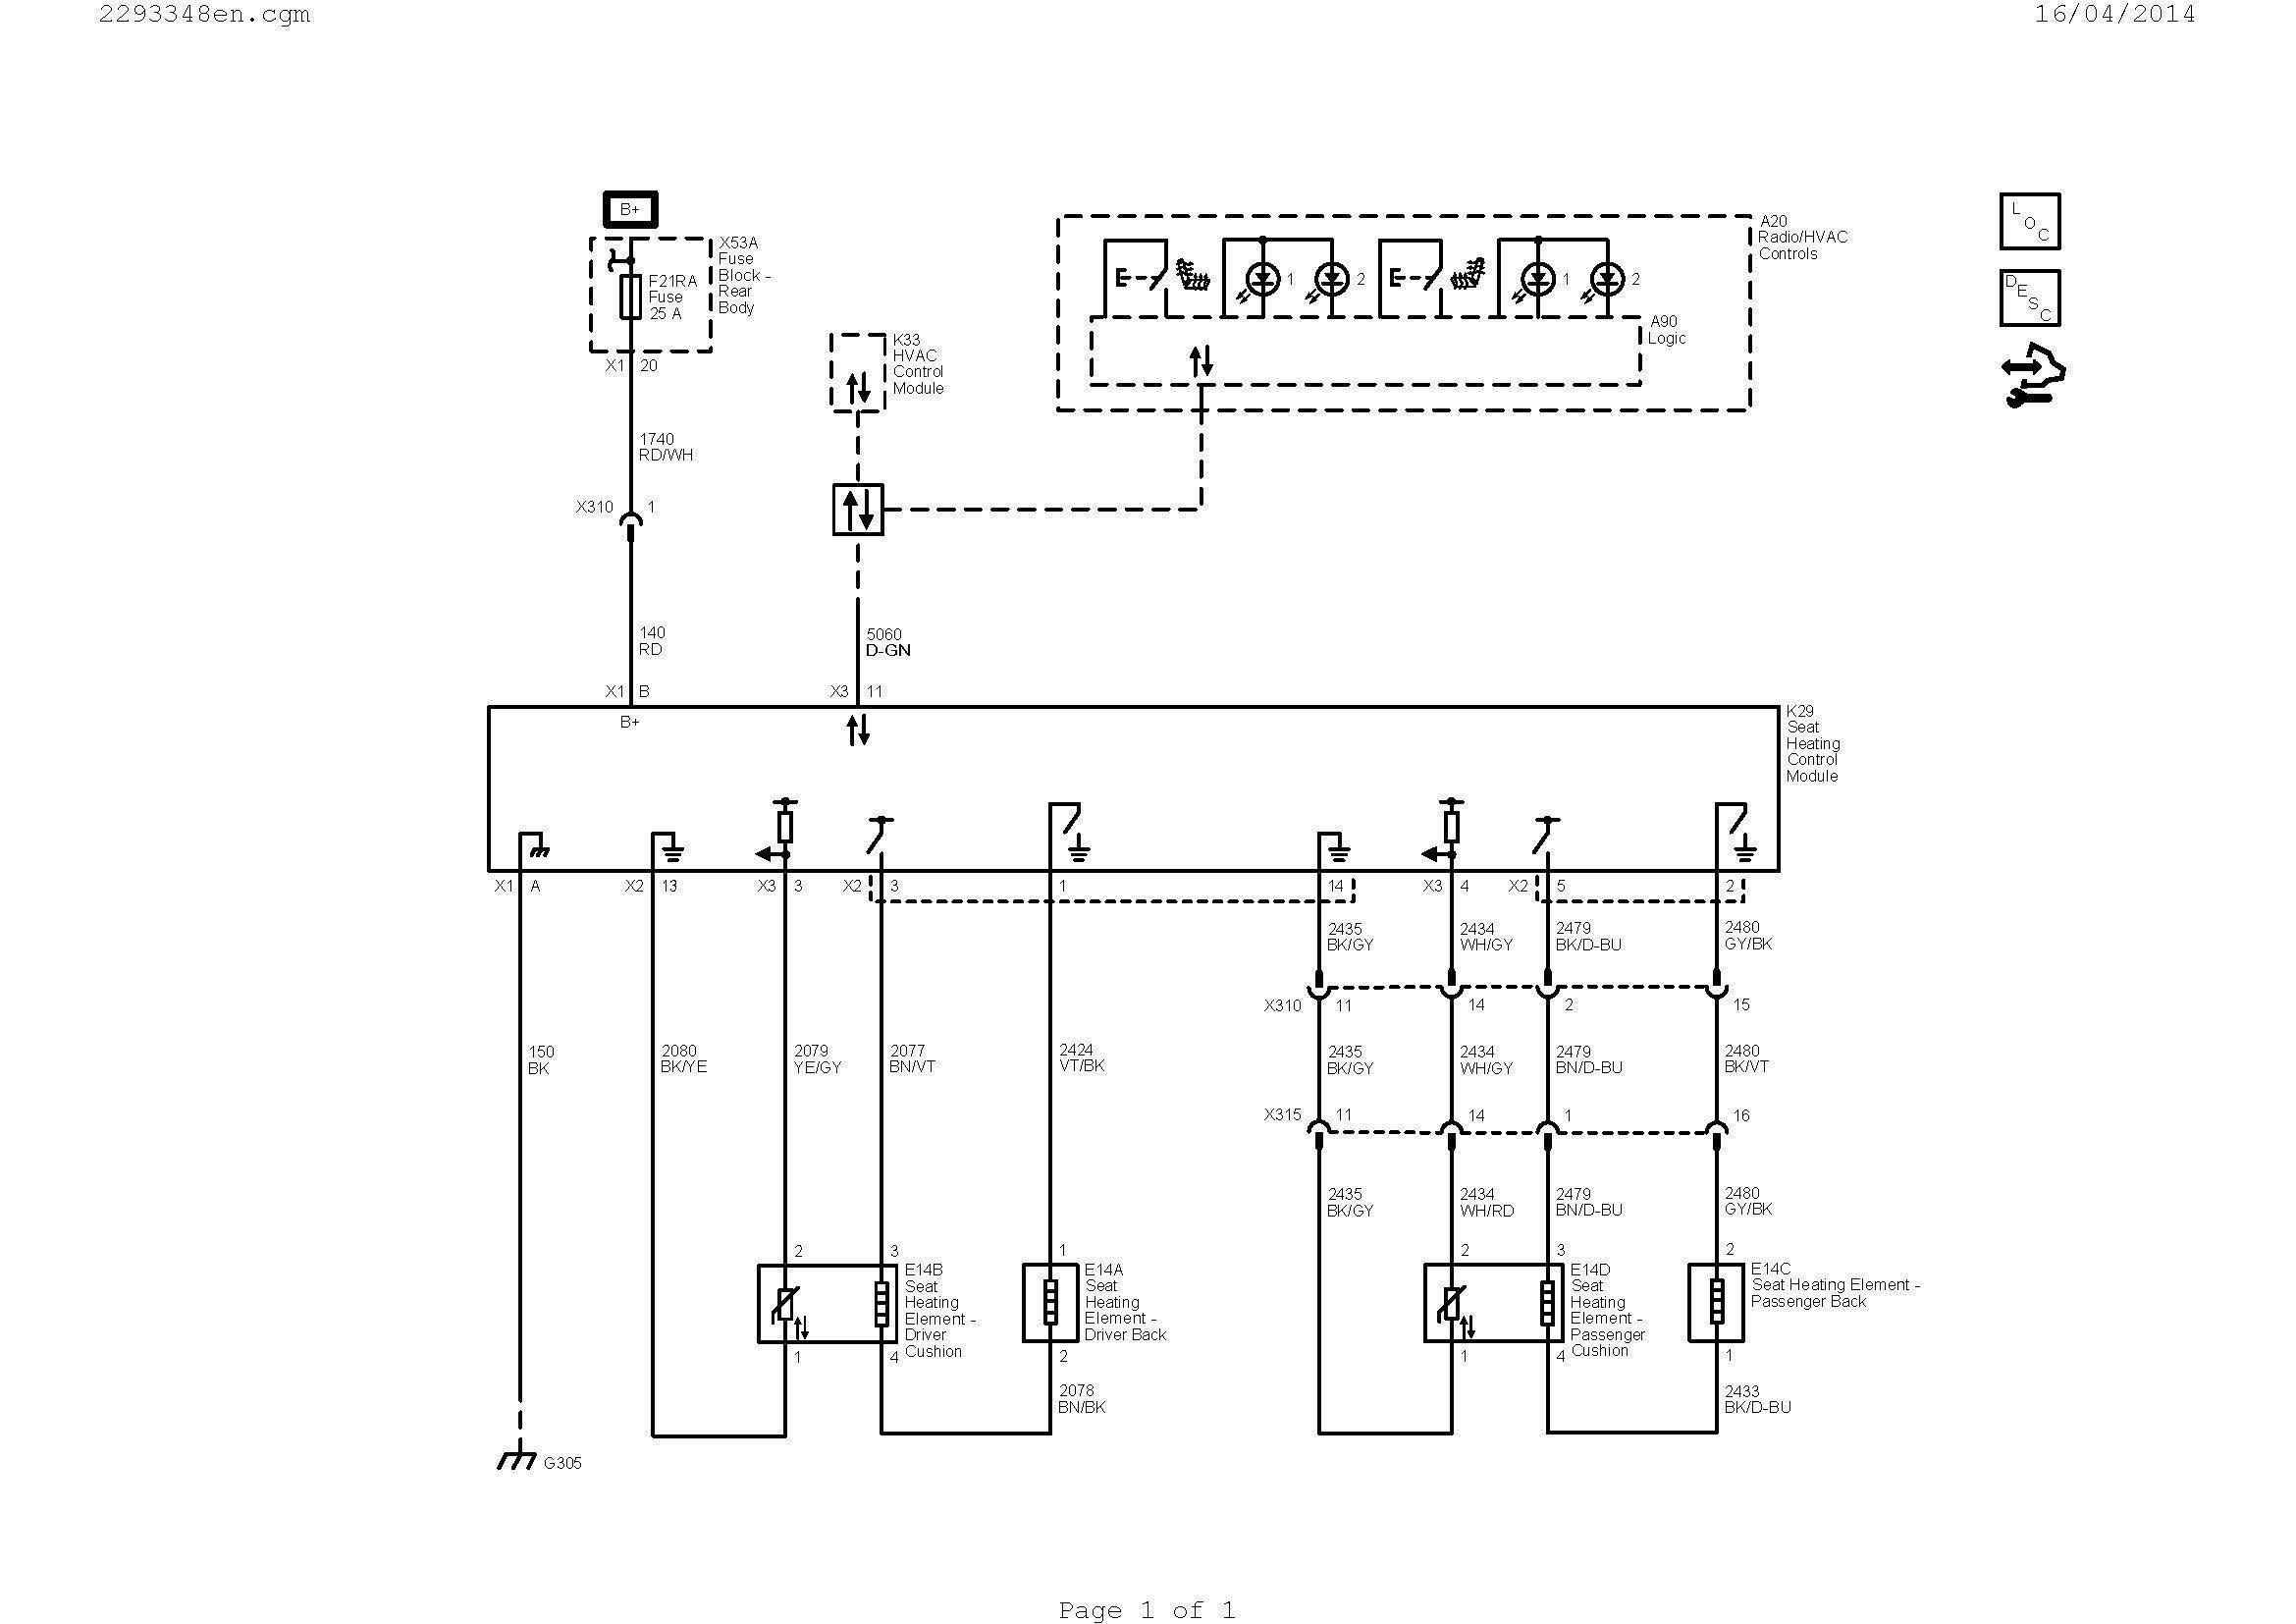 Vehicle Ac System Diagram Wiring Diagram Car Ac Inspirationa Awesome Car Ac System Diagram Of Vehicle Ac System Diagram